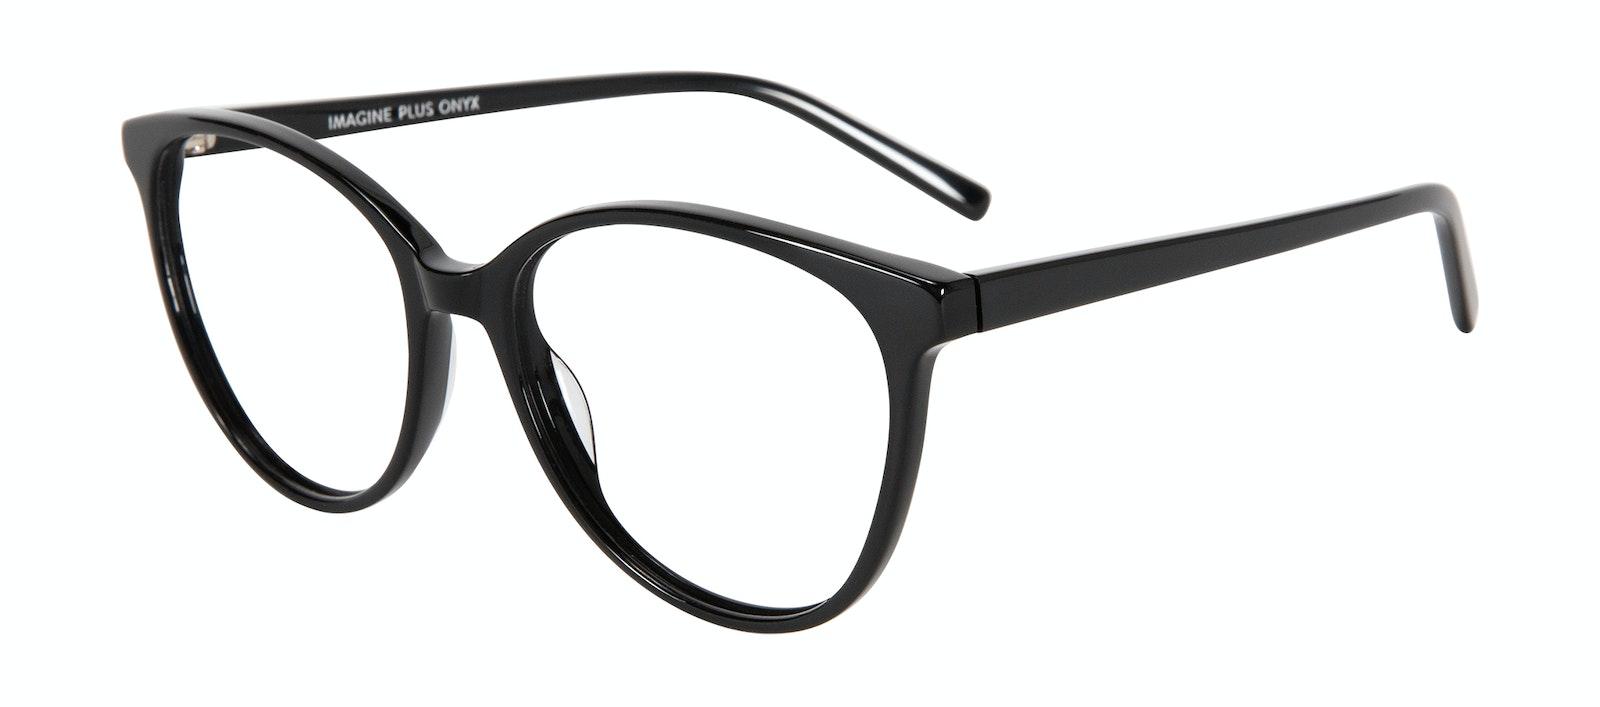 Affordable Fashion Glasses Cat Eye Eyeglasses Women Imagine Plus Onyx Tilt